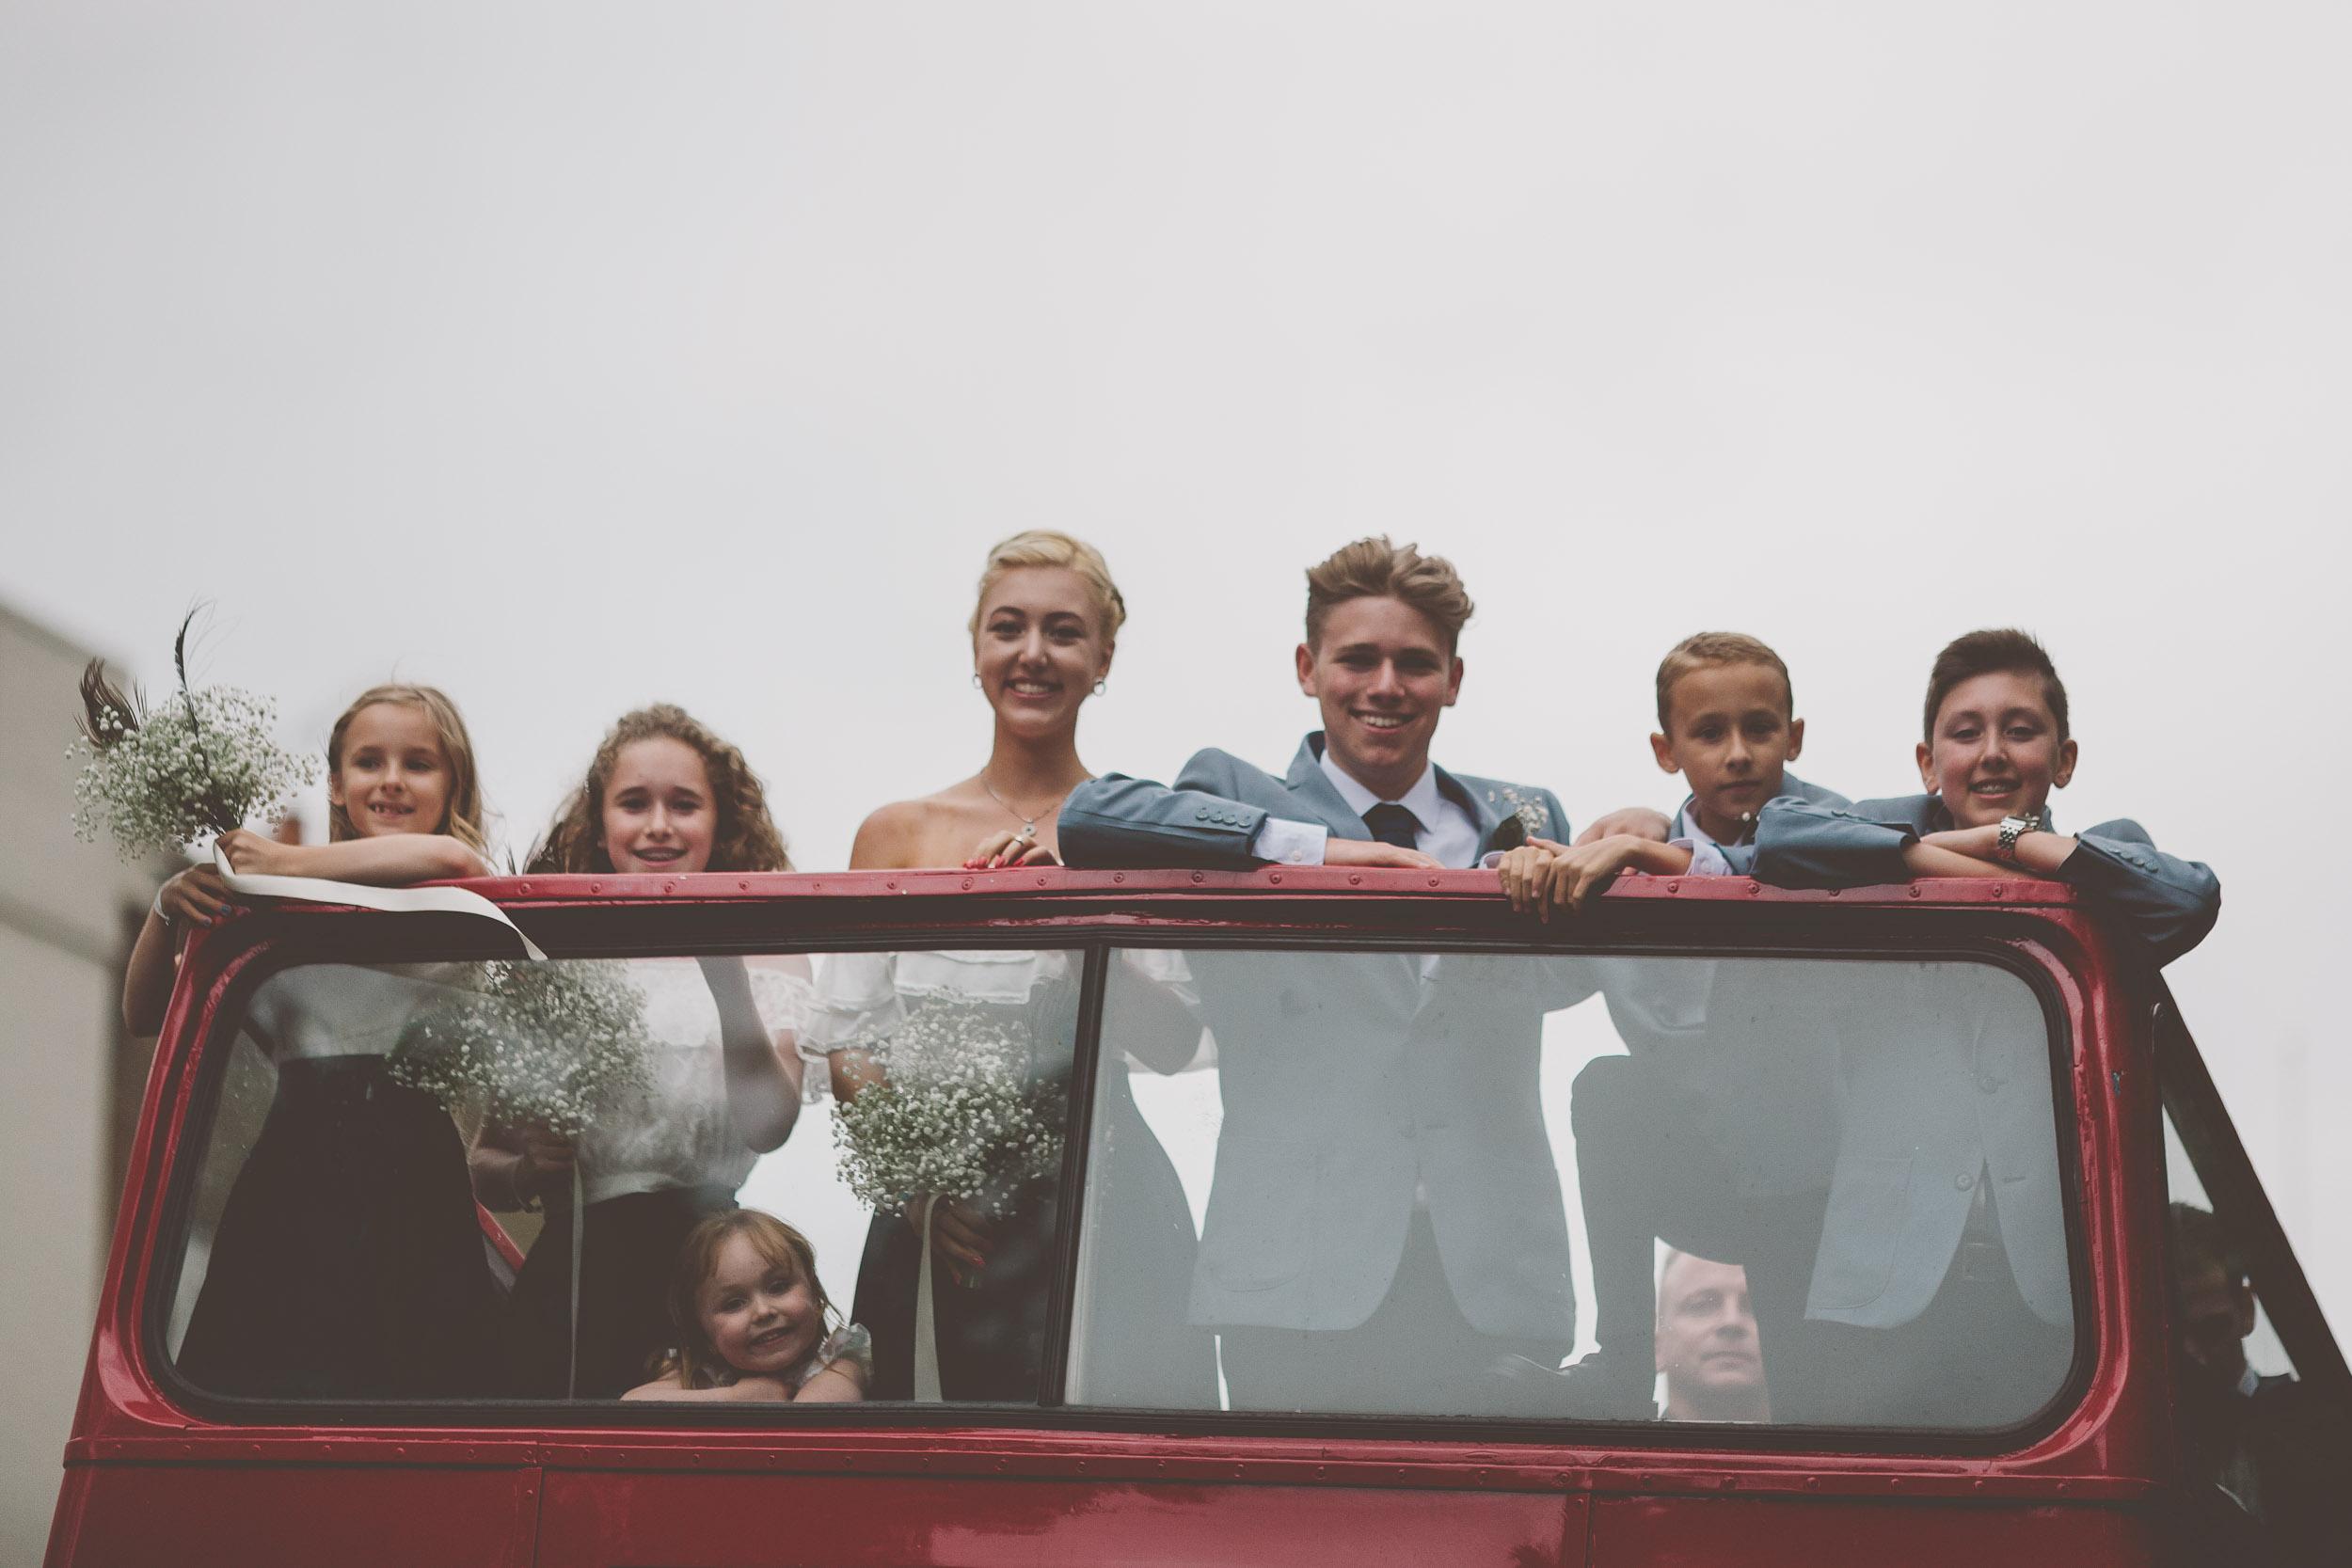 islington-town-hall-4th-floor-studios-wedding183.jpg